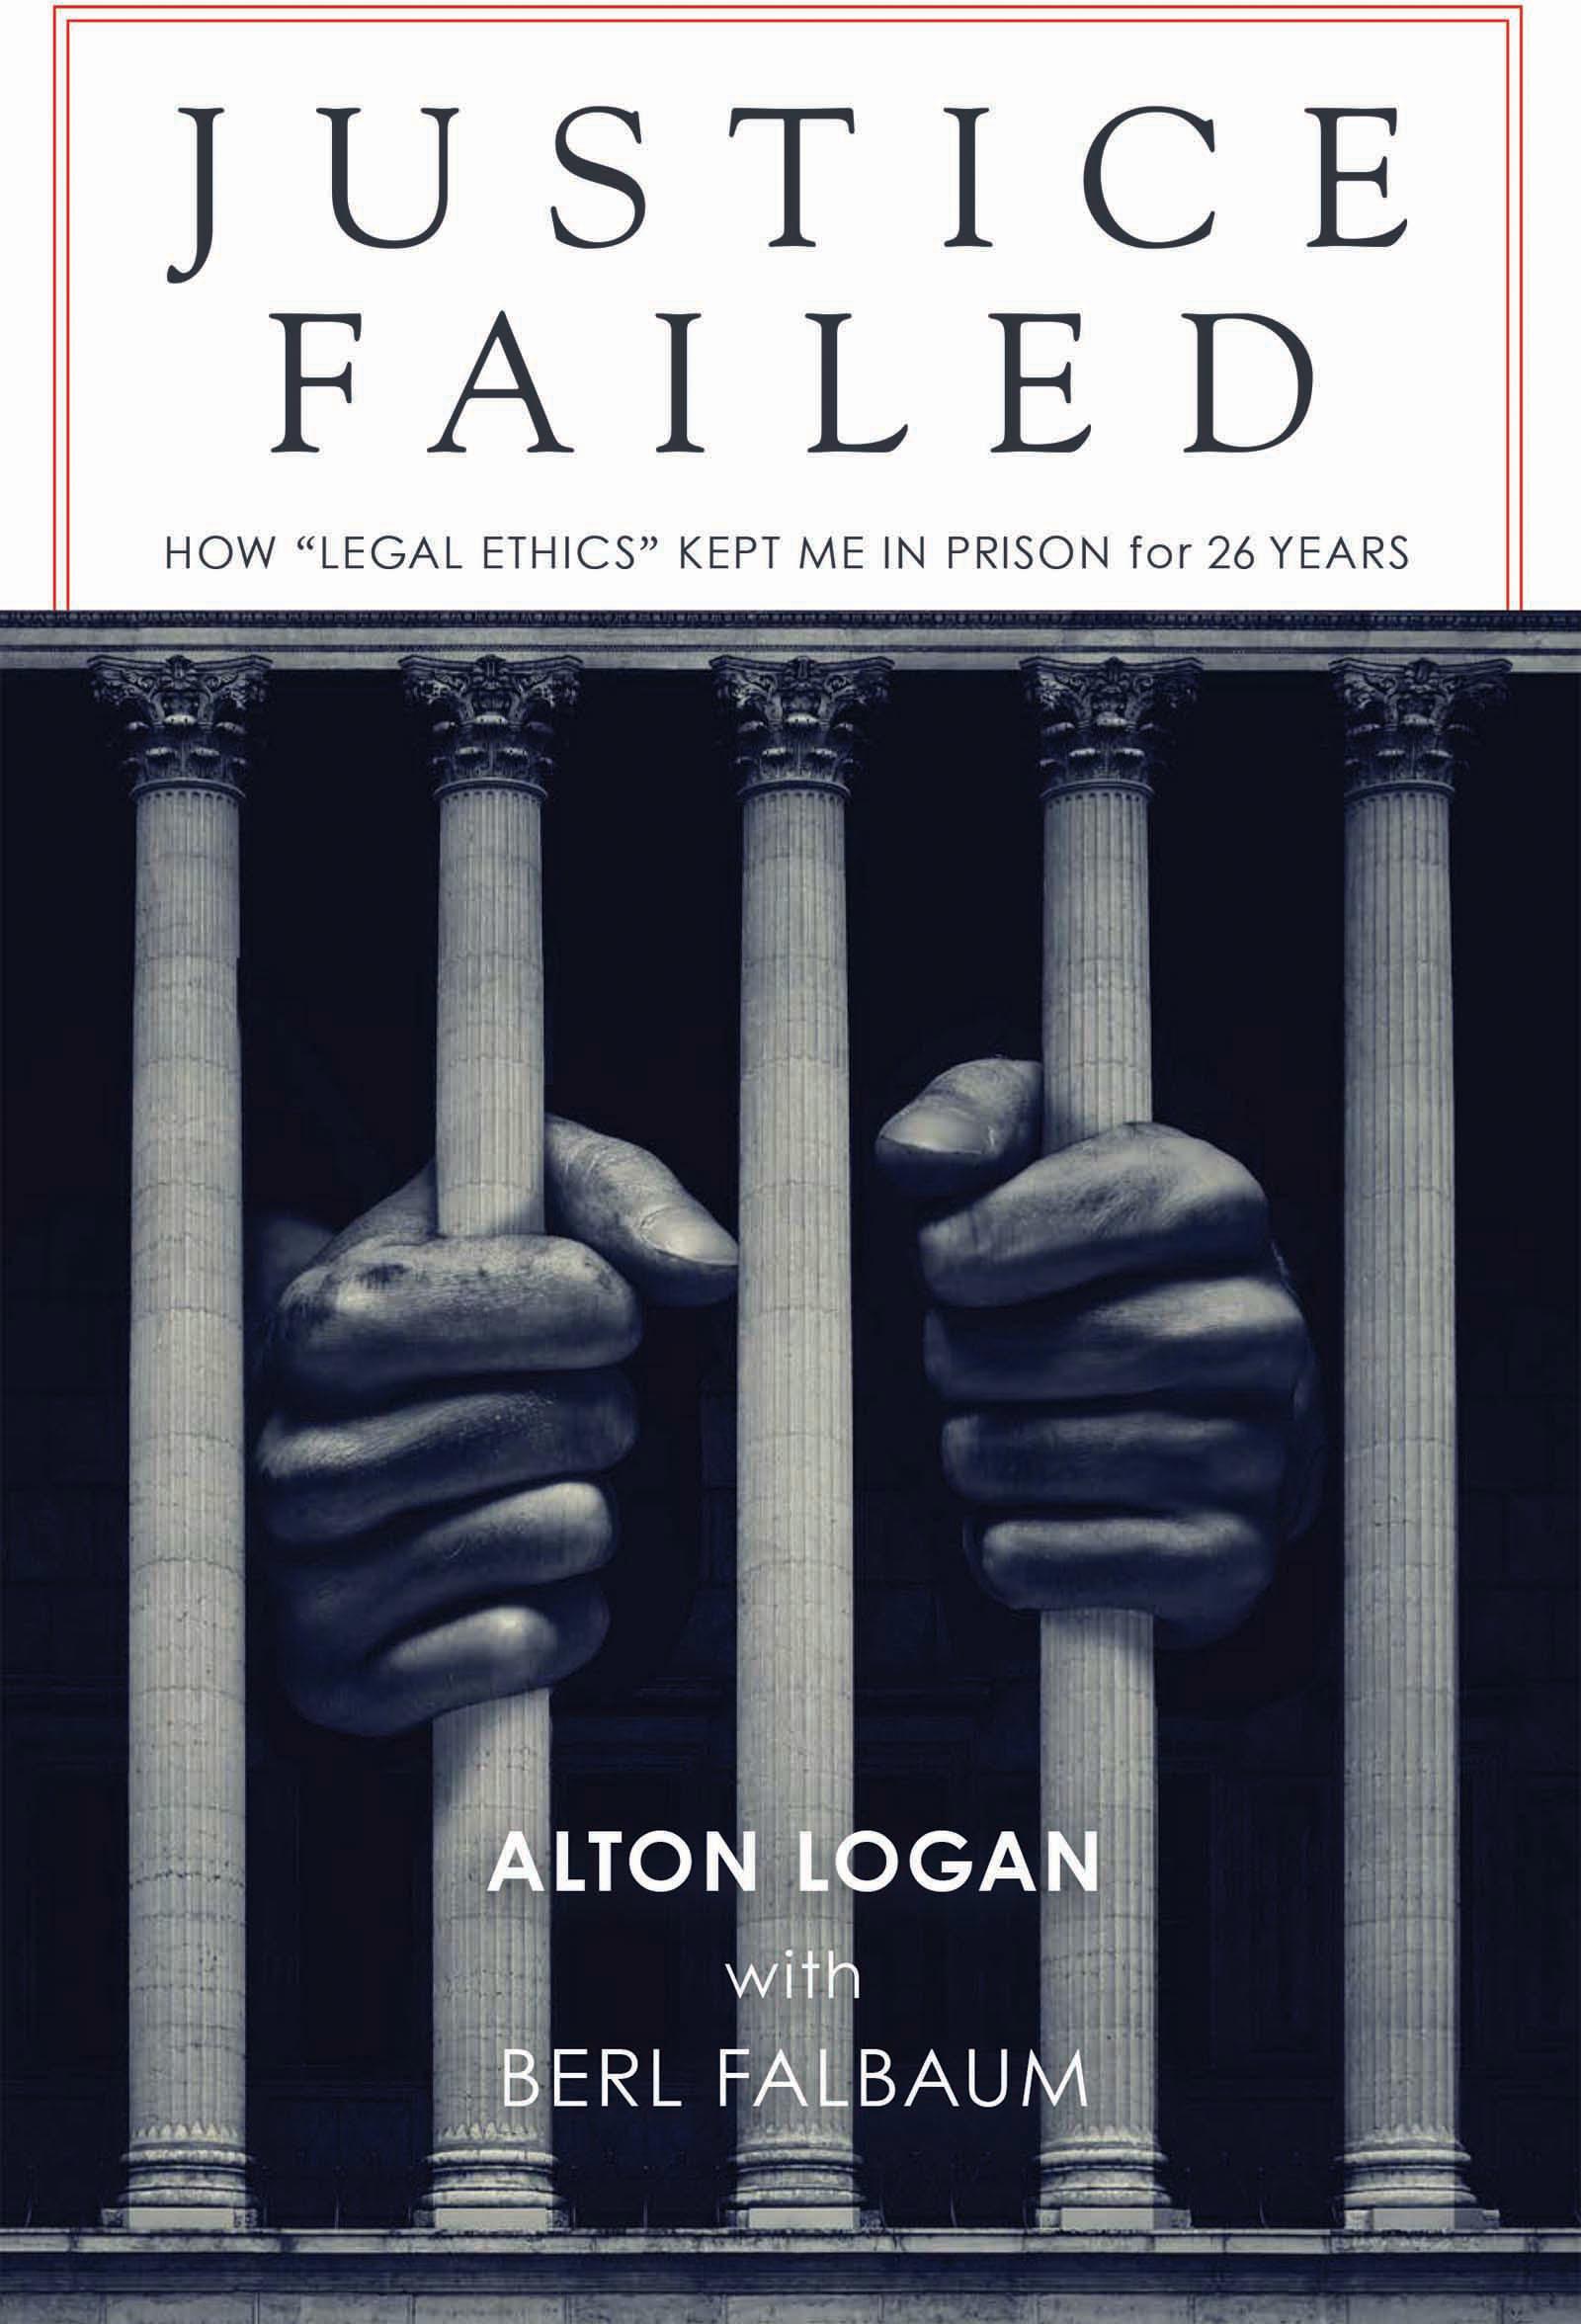 Justice Failed by Alton Logan